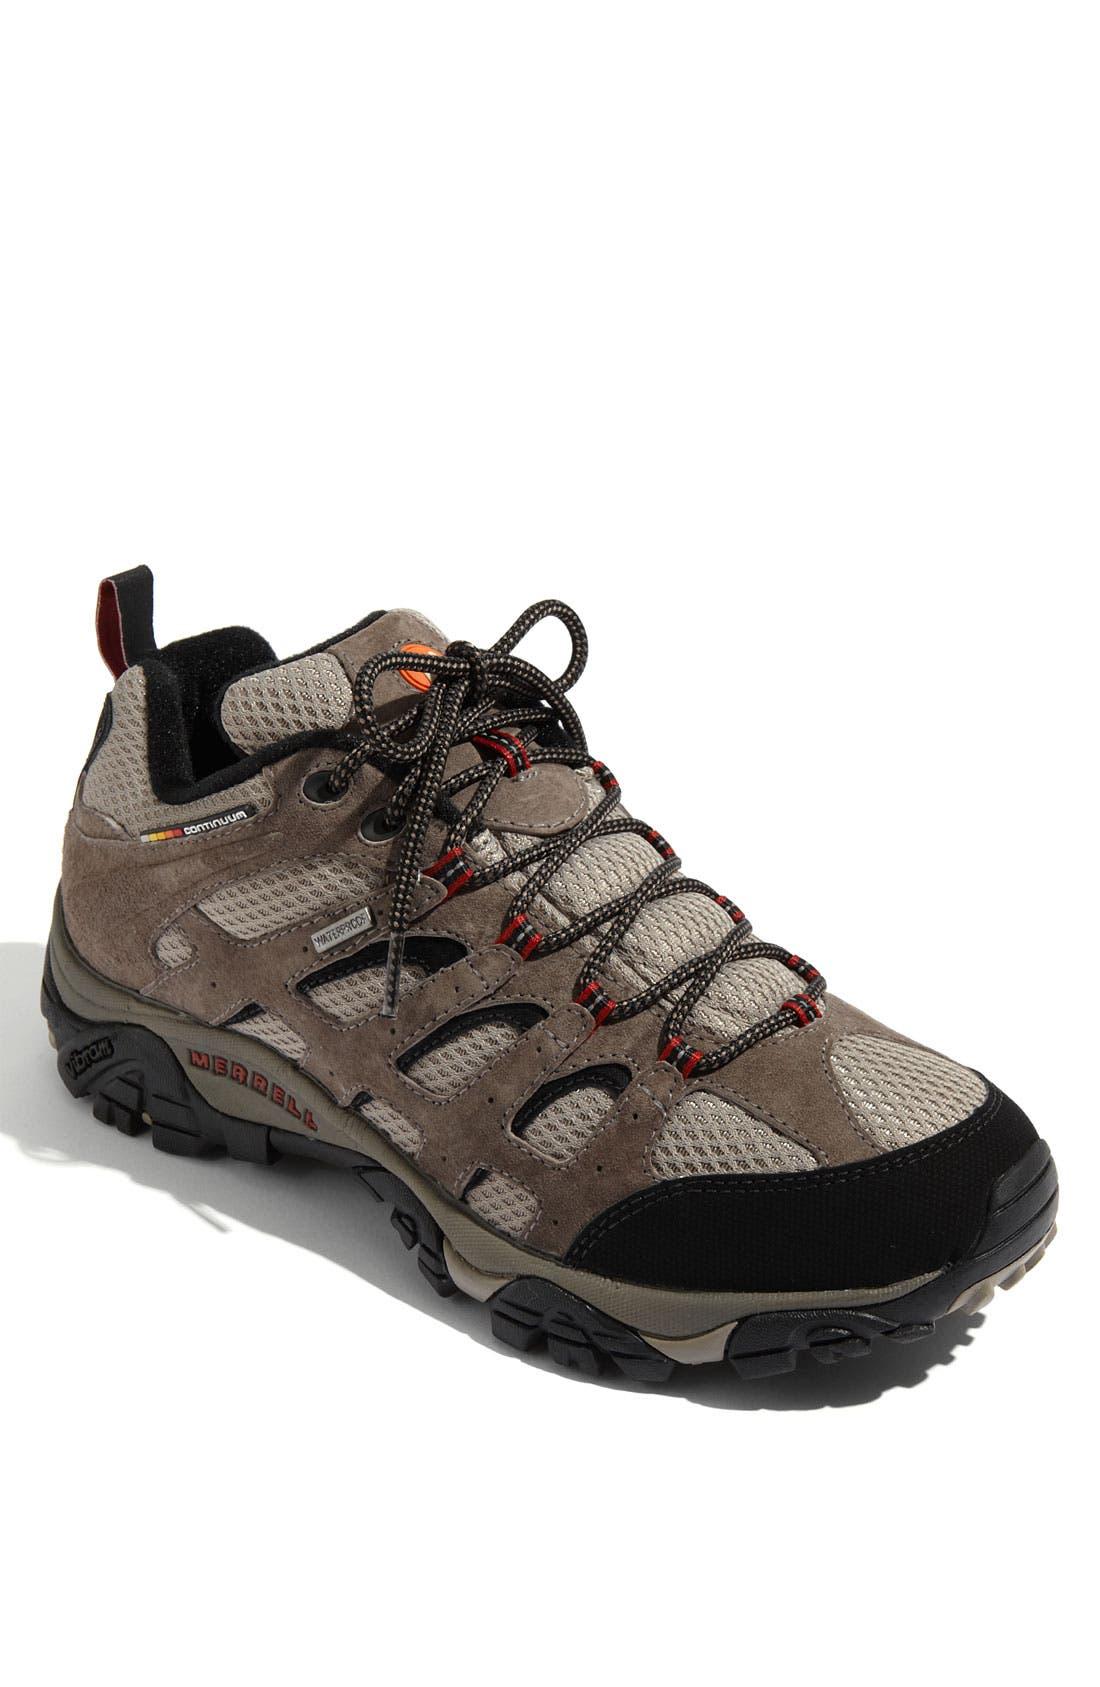 Main Image - Merrell 'Moab' Waterproof Hiking Shoe (Men)